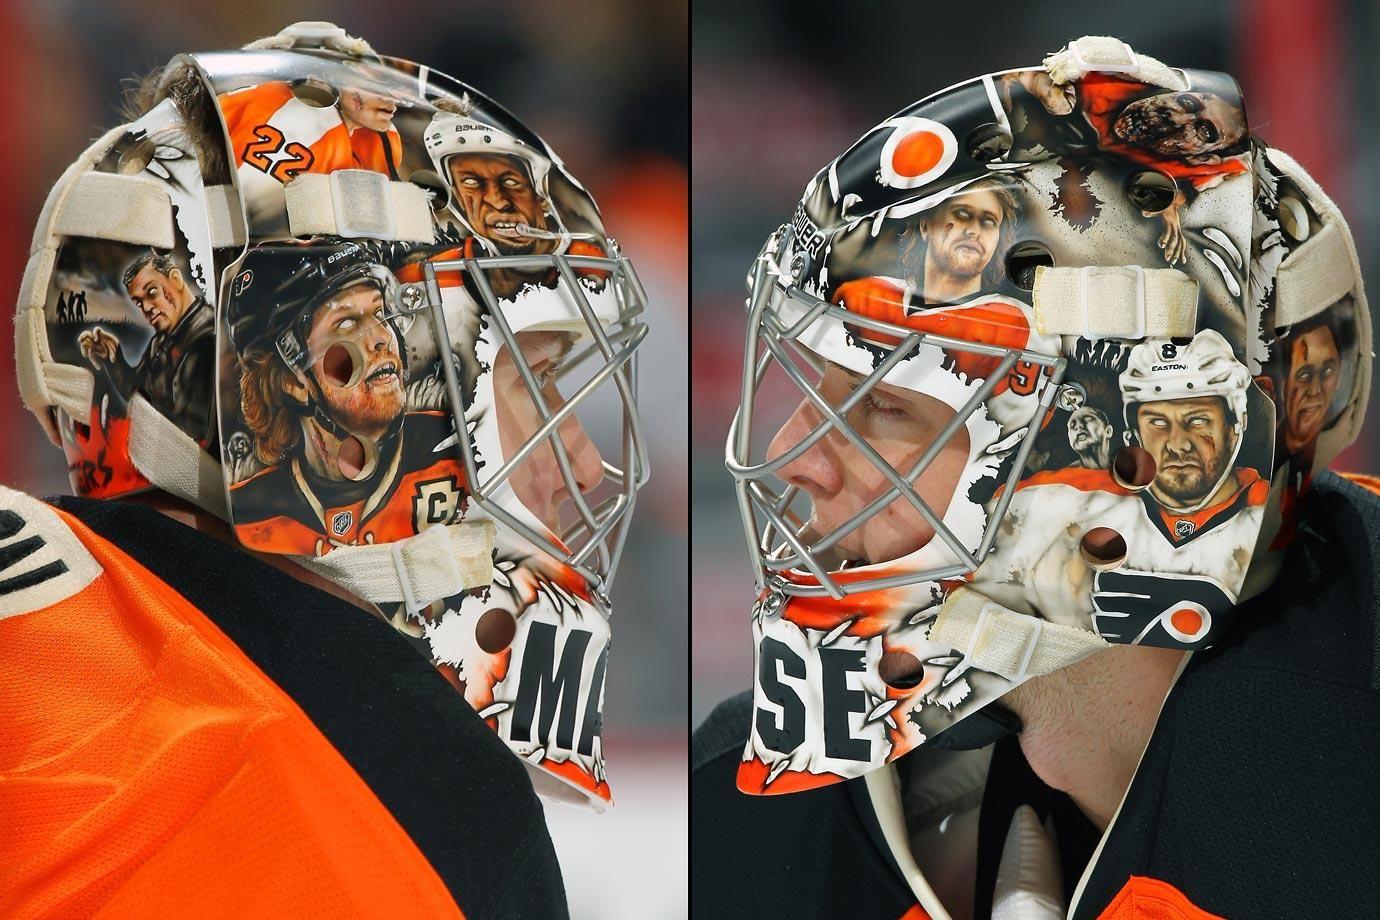 NHL Goalie Masks by Team Goalie mask, Goalie, Nhl